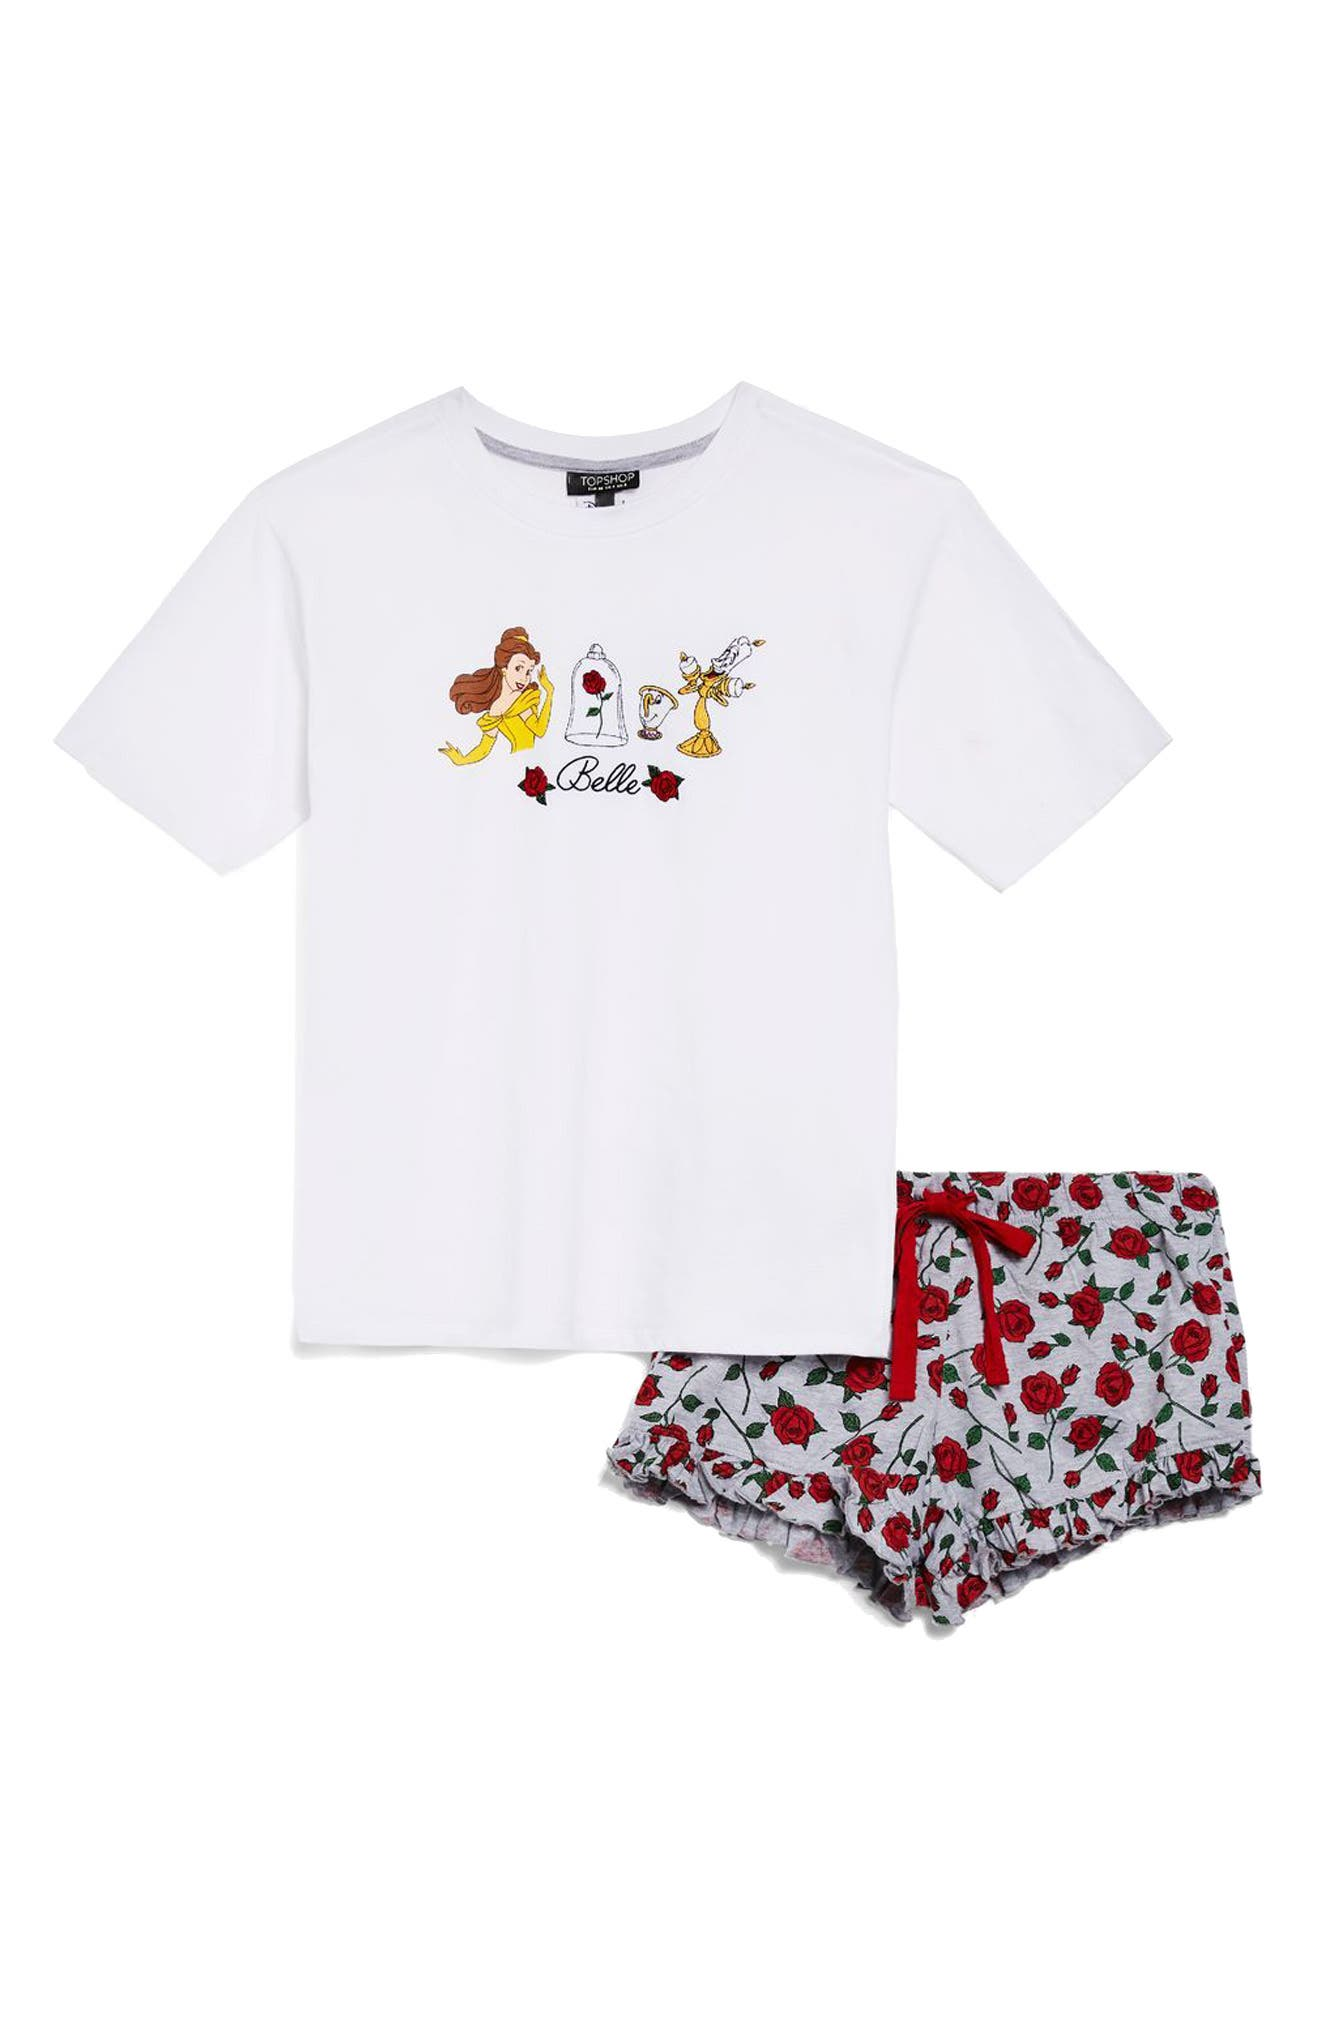 Disney<sup>®</sup> Belle Rose Short Pajamas,                             Alternate thumbnail 3, color,                             White Multi